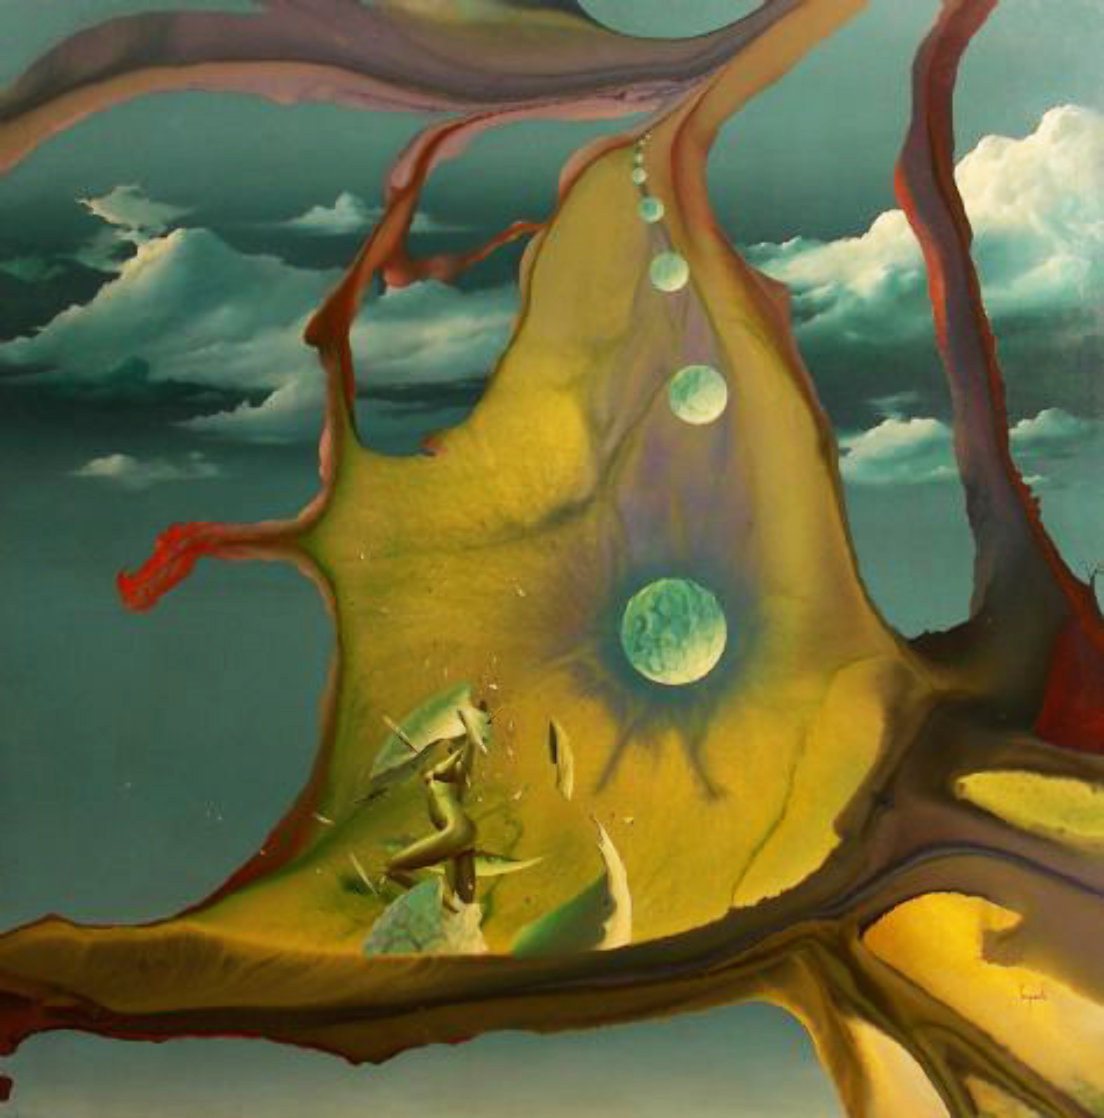 Crystal Ooze 1980 44x44 Super Huge  Original Painting by Dario Campanile